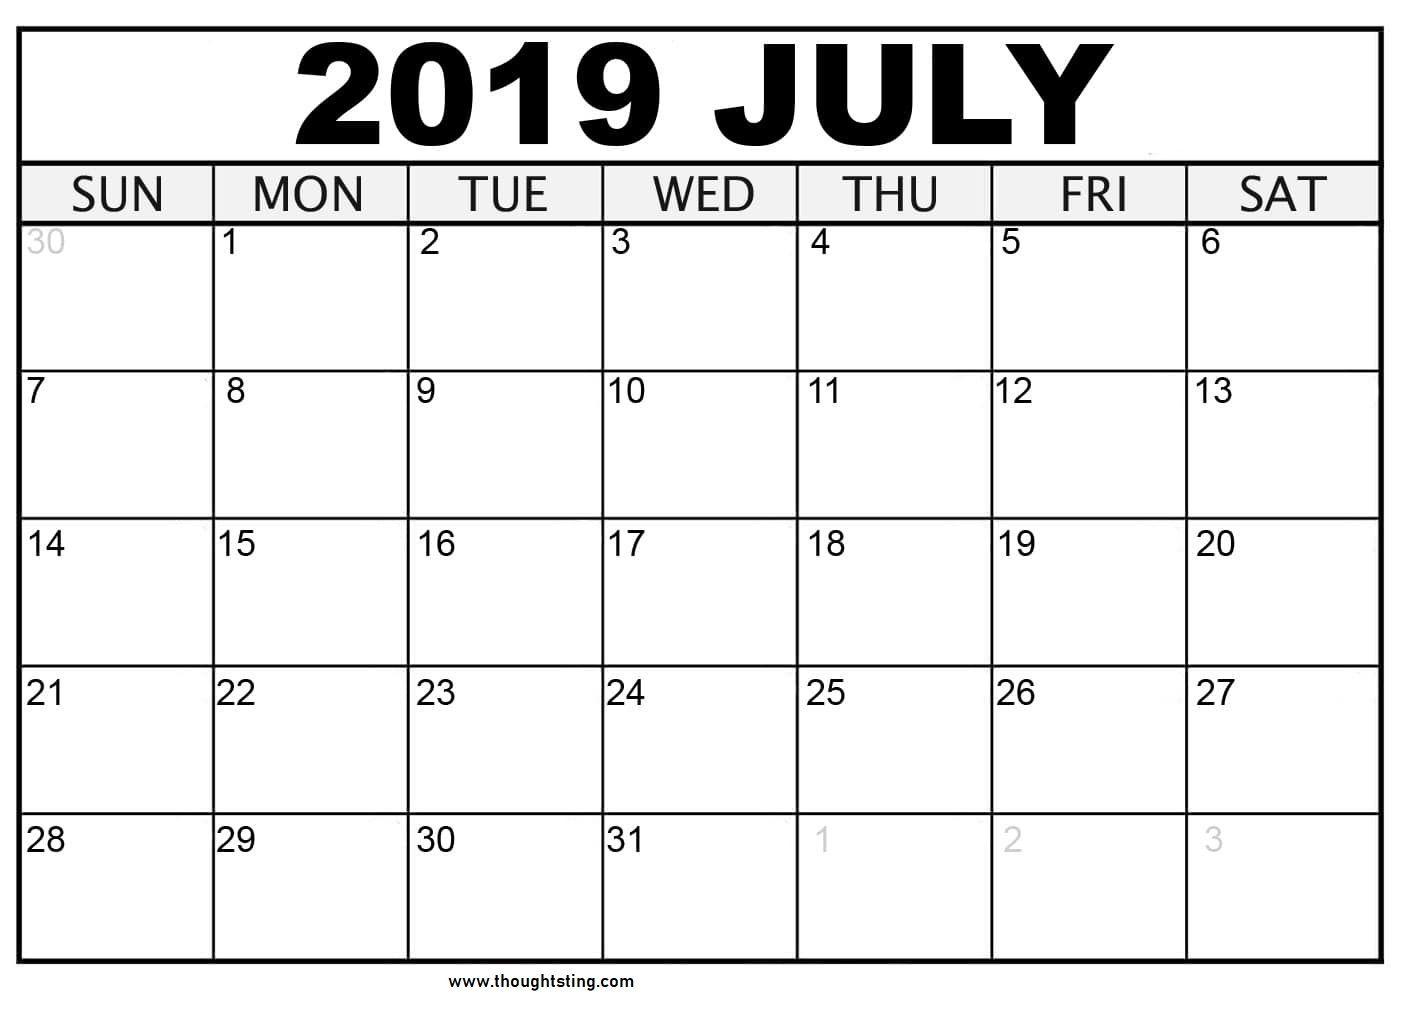 026 Blank Monthly Calendar Template Pdf Unusual Ideas 2020